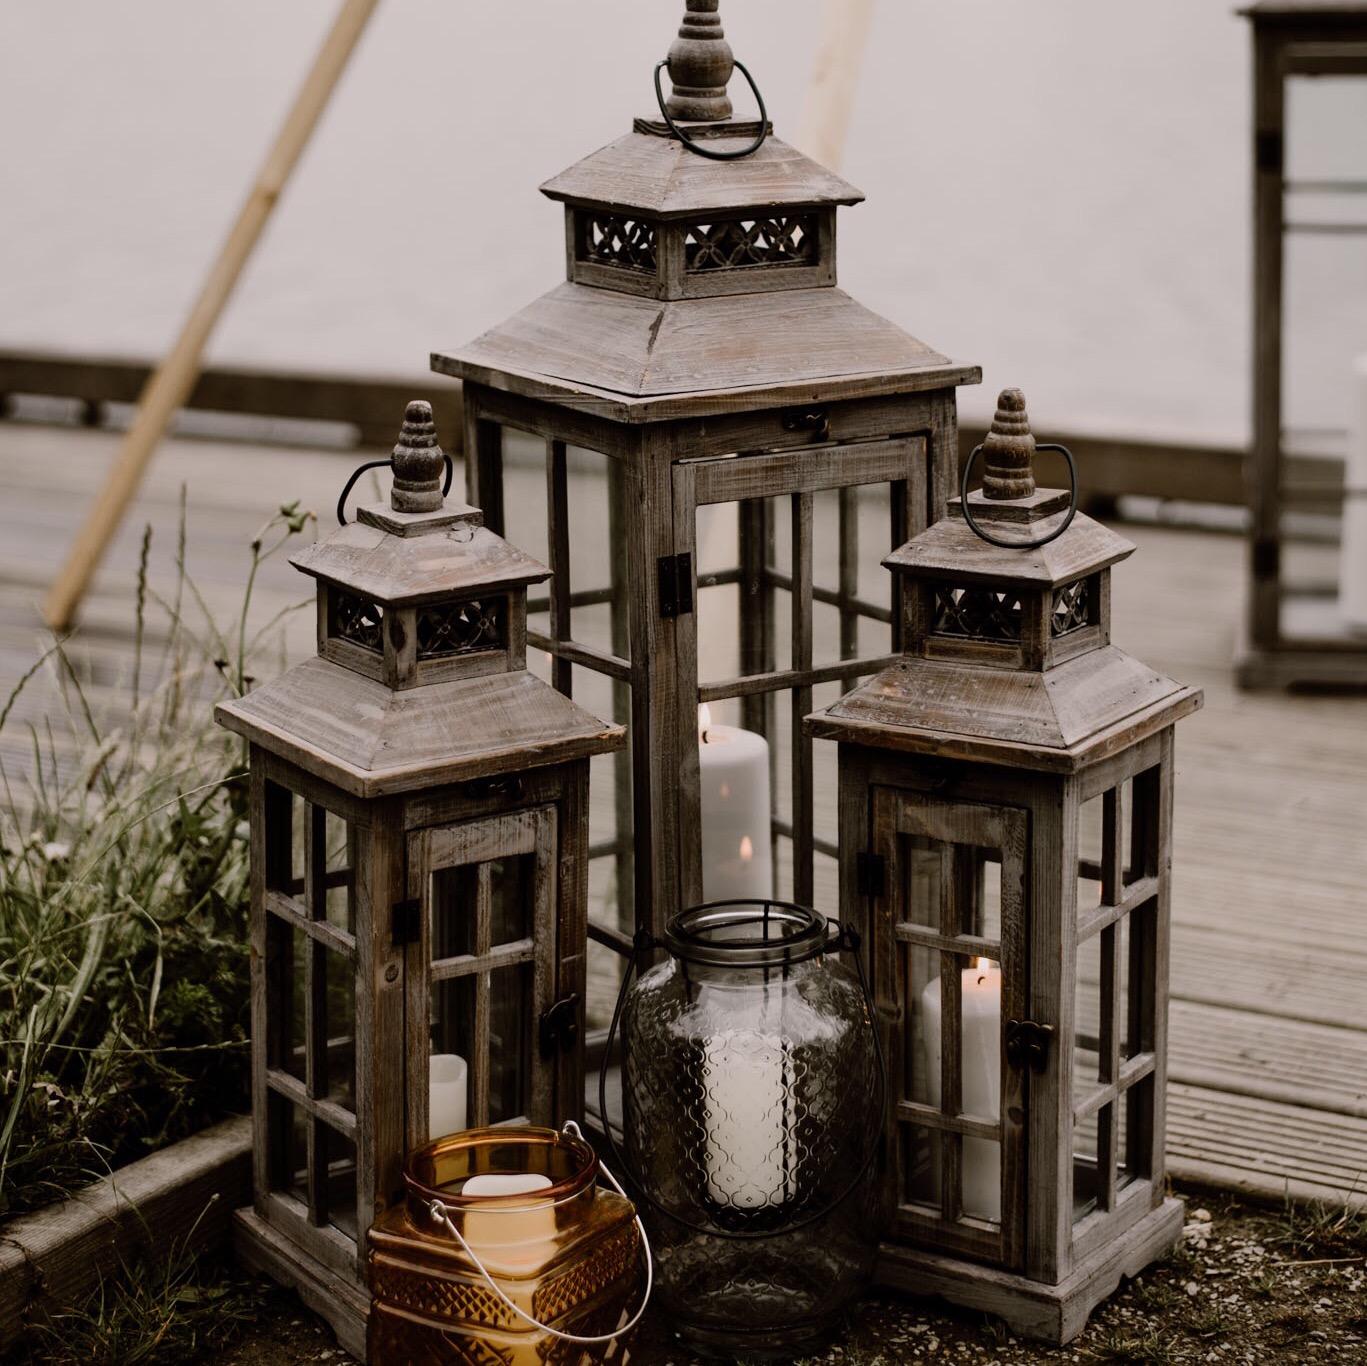 Ensemble Arche en Bois + Lanternes